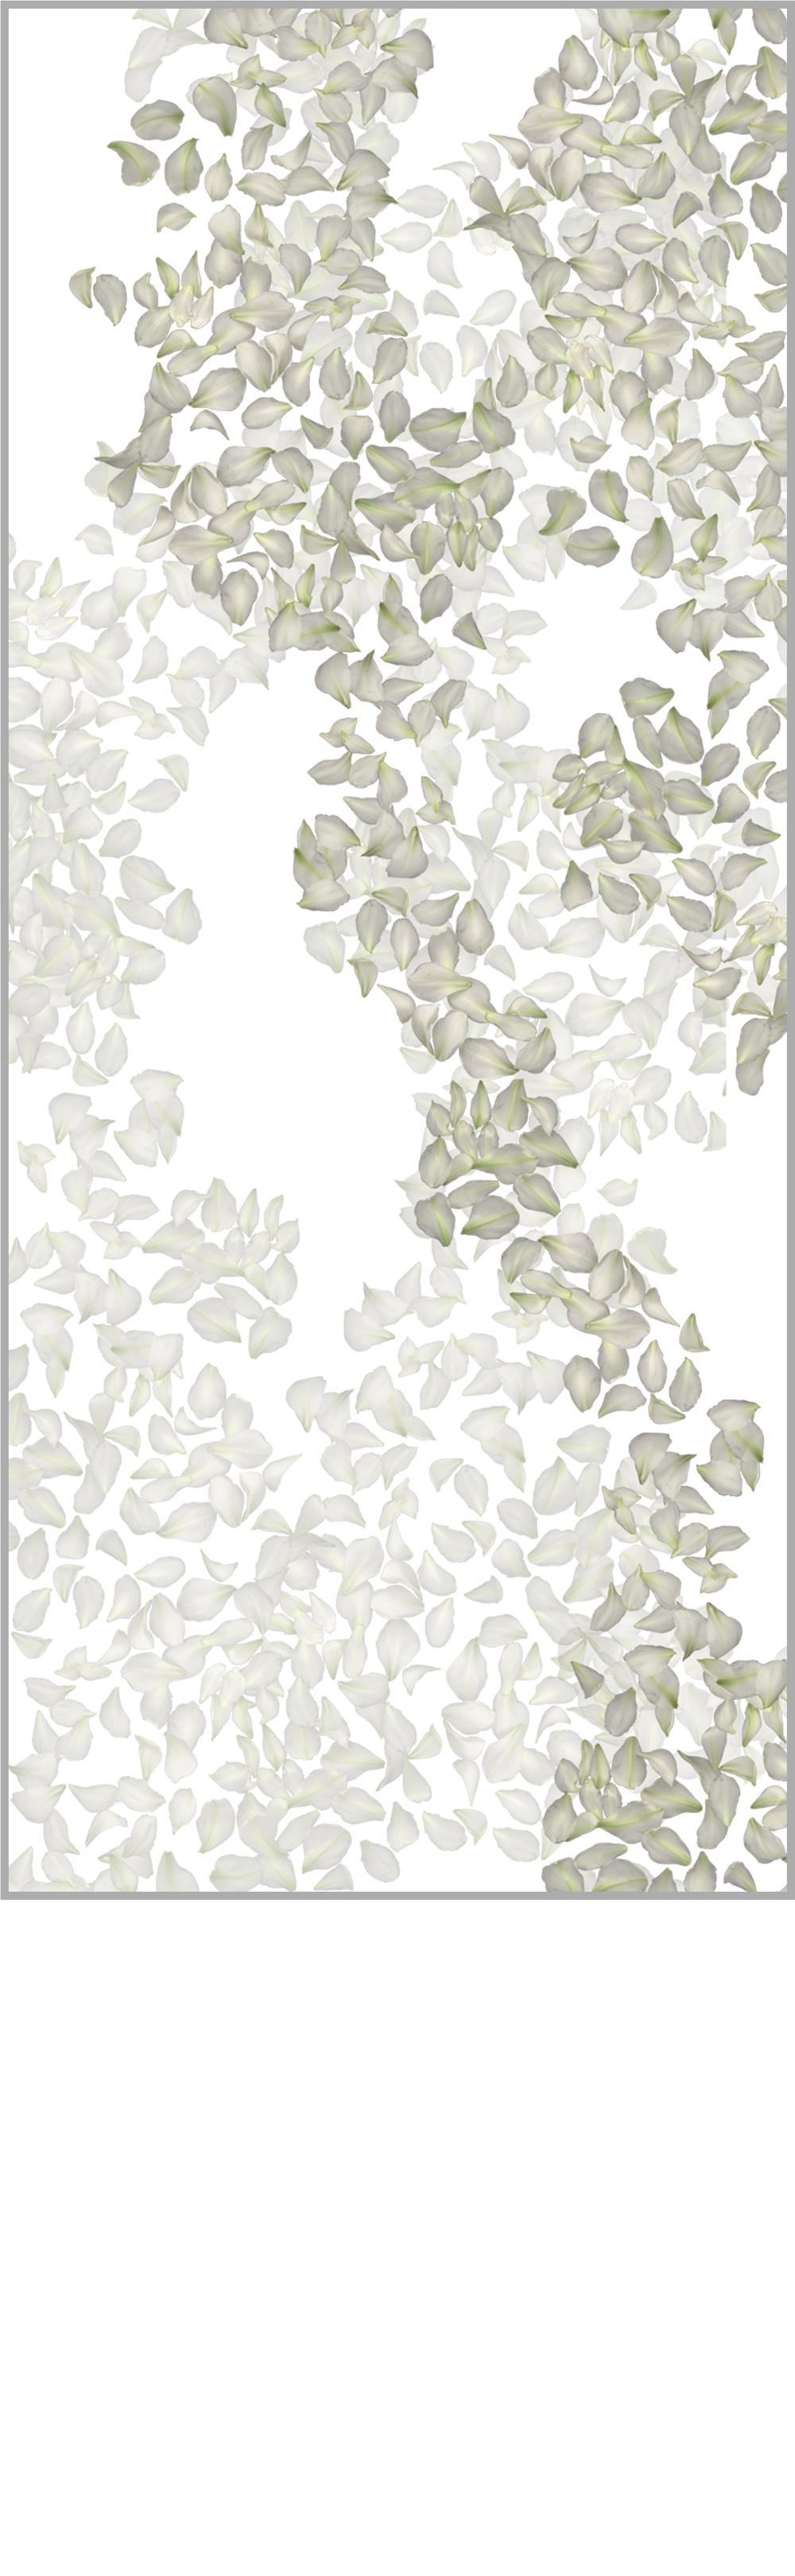 leaf_white.jpg